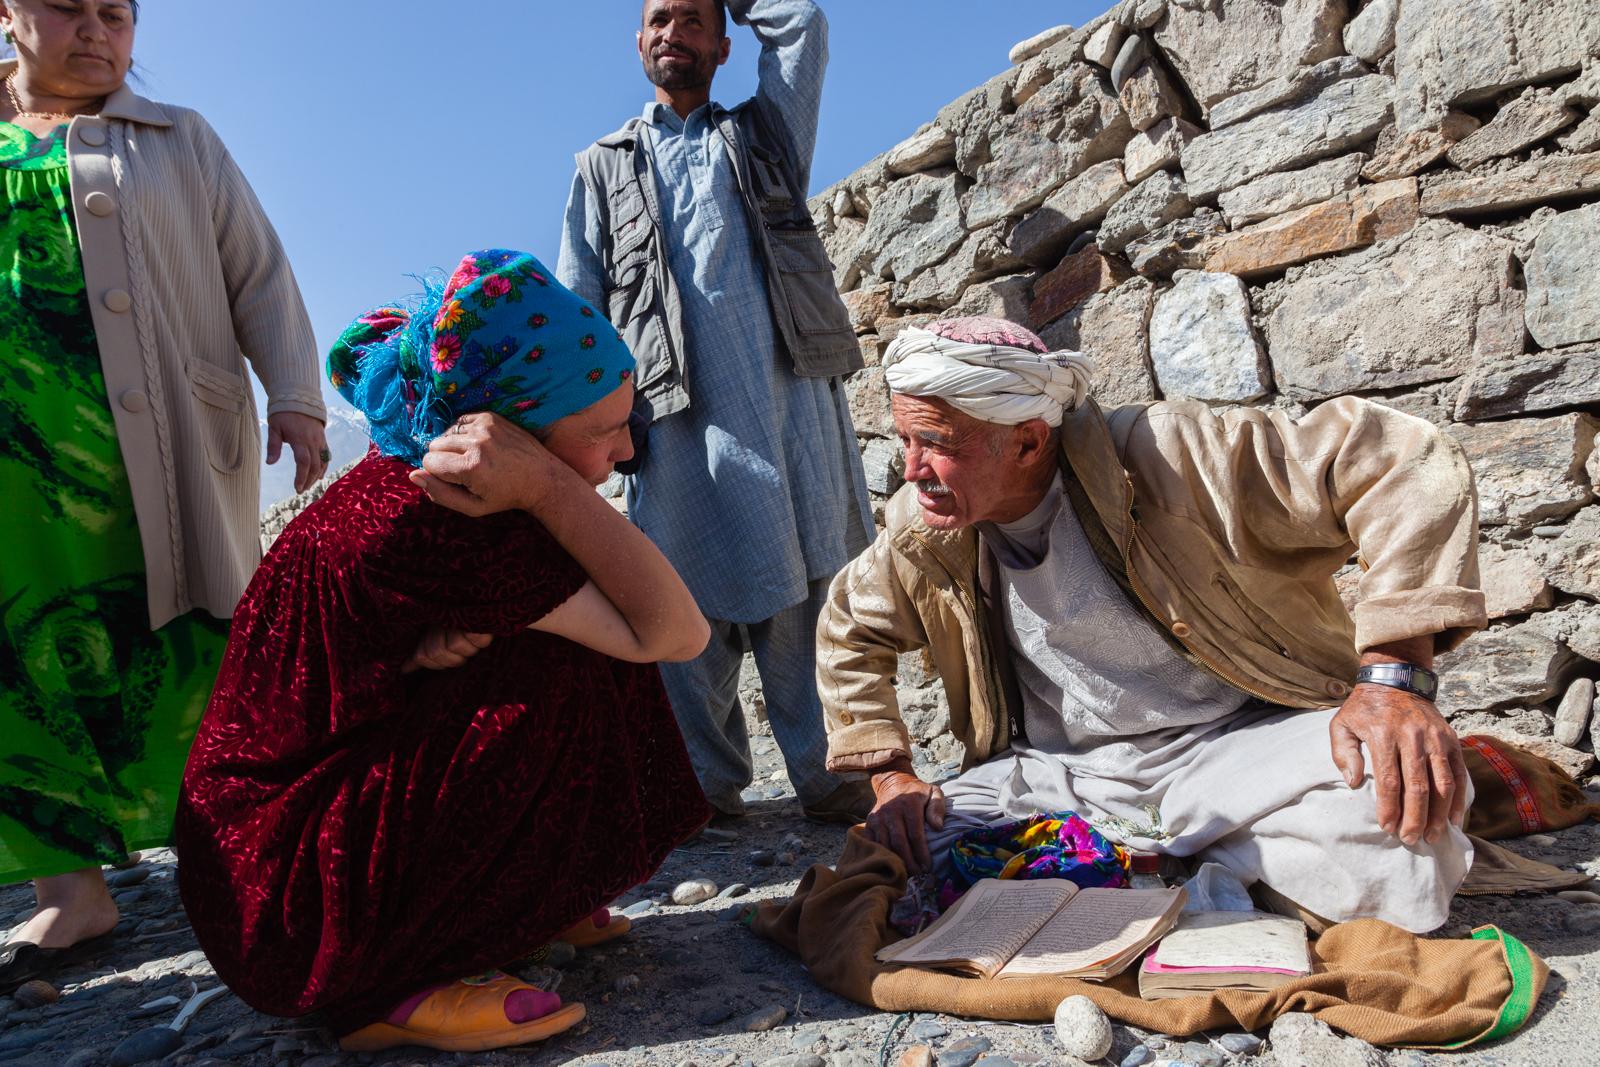 Fortune teller at the Panj River bazaar. Credit: Andy Isaacson